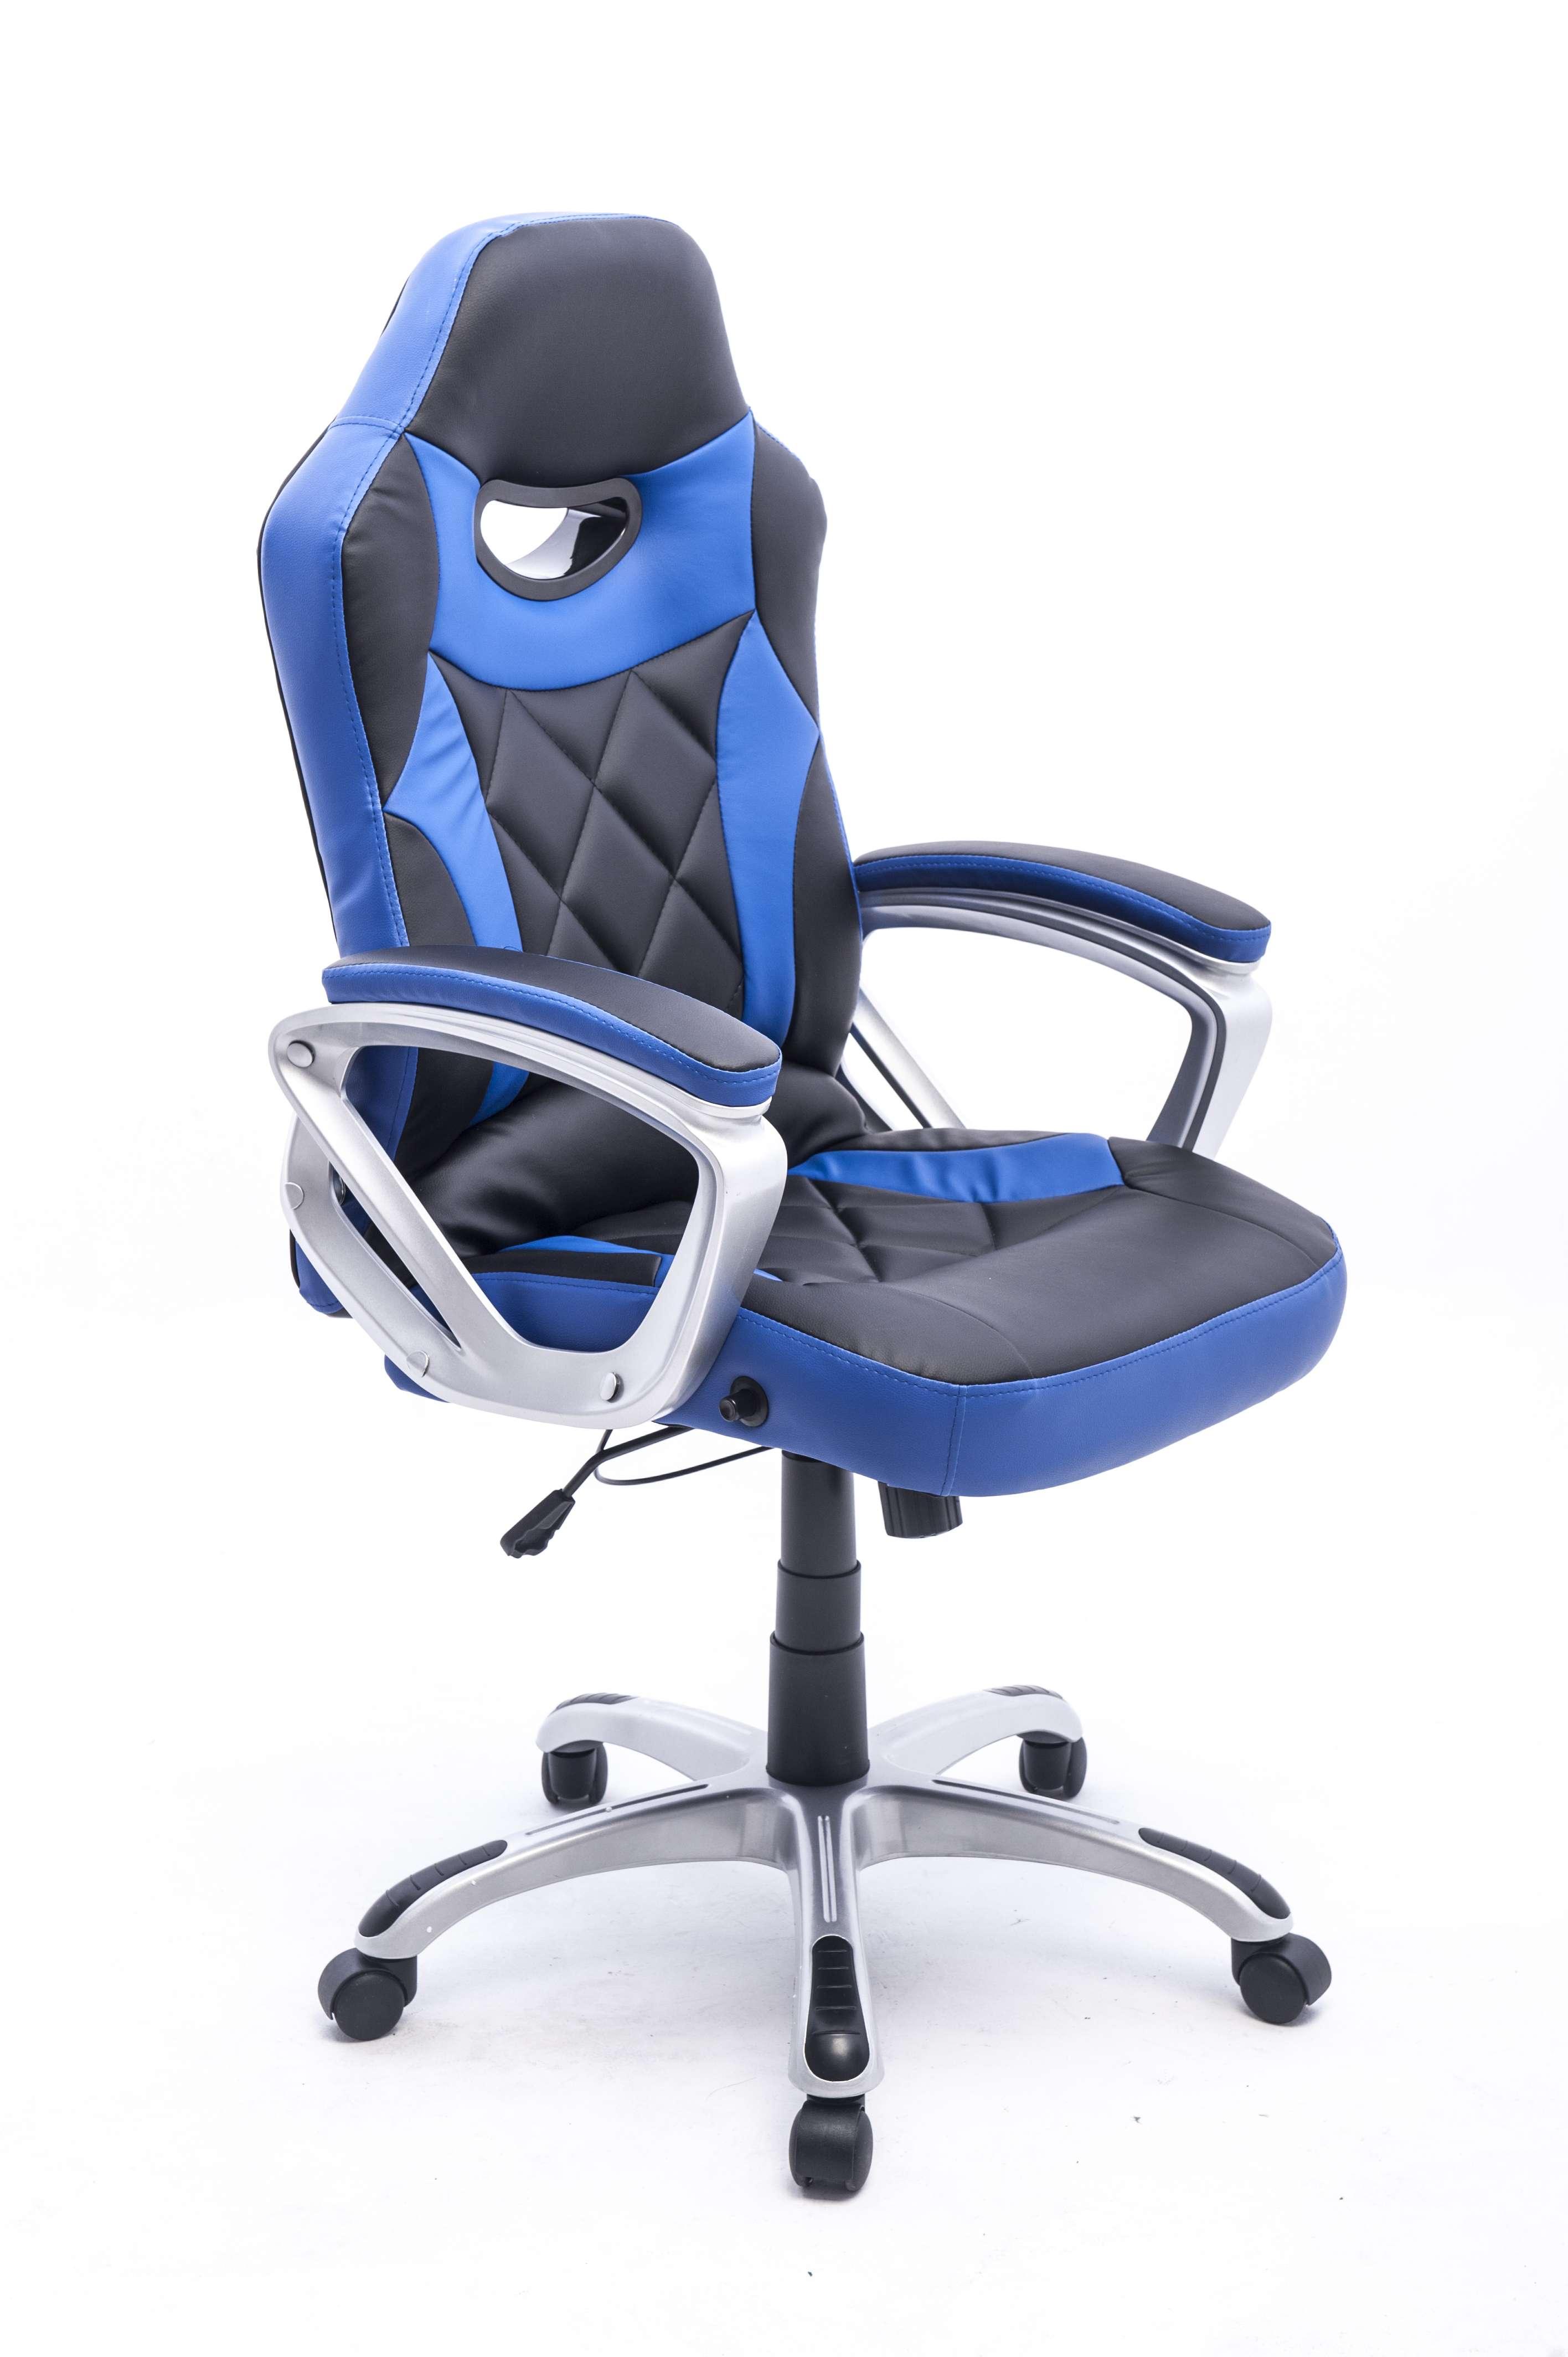 RayGar Sports Gaming Racing Chair Swivel Reclining puter Desk